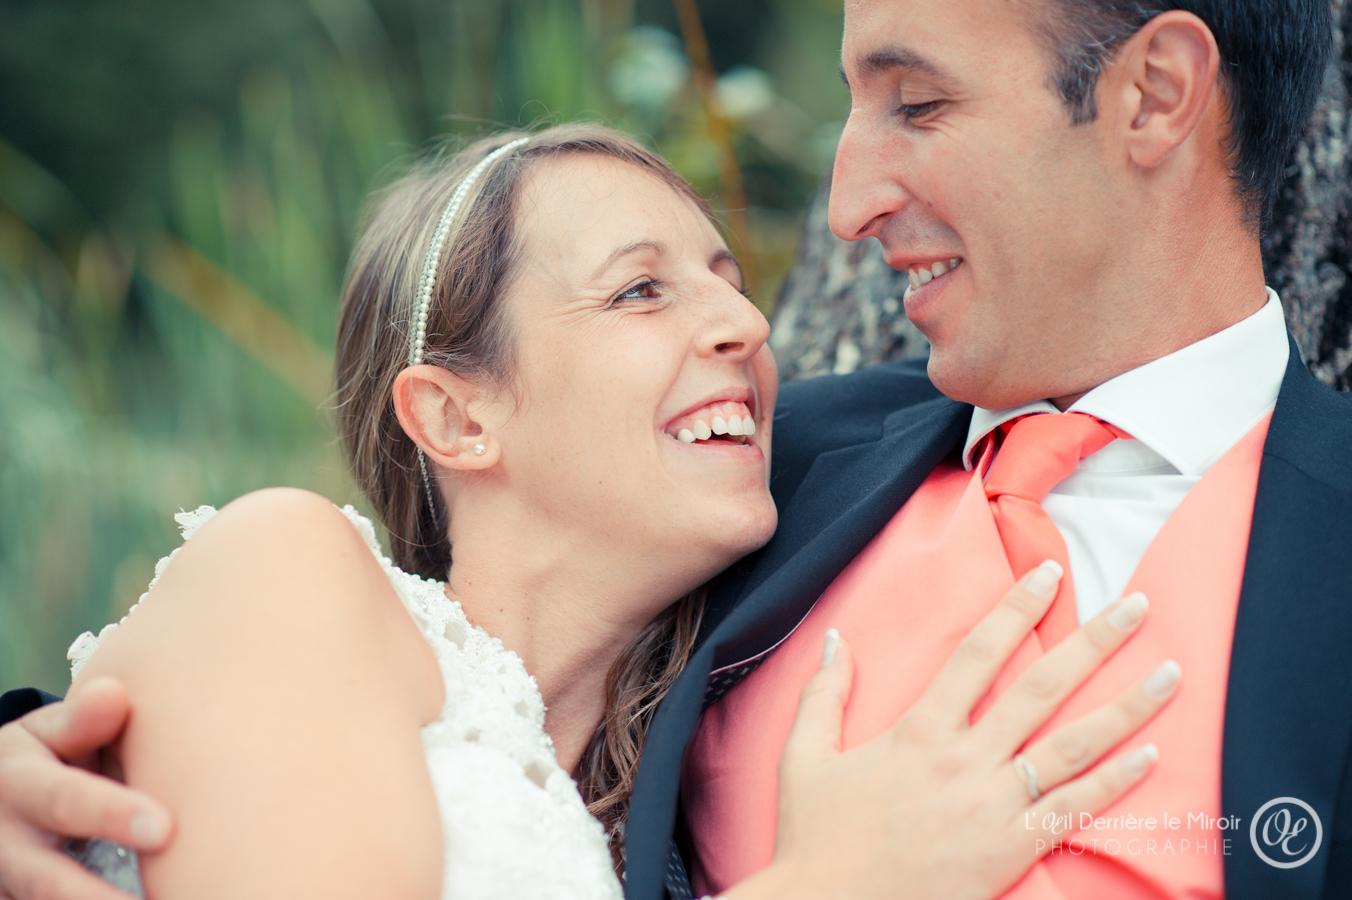 After-wedding-Audrey-Luis-loeilderrierelemiroir-23